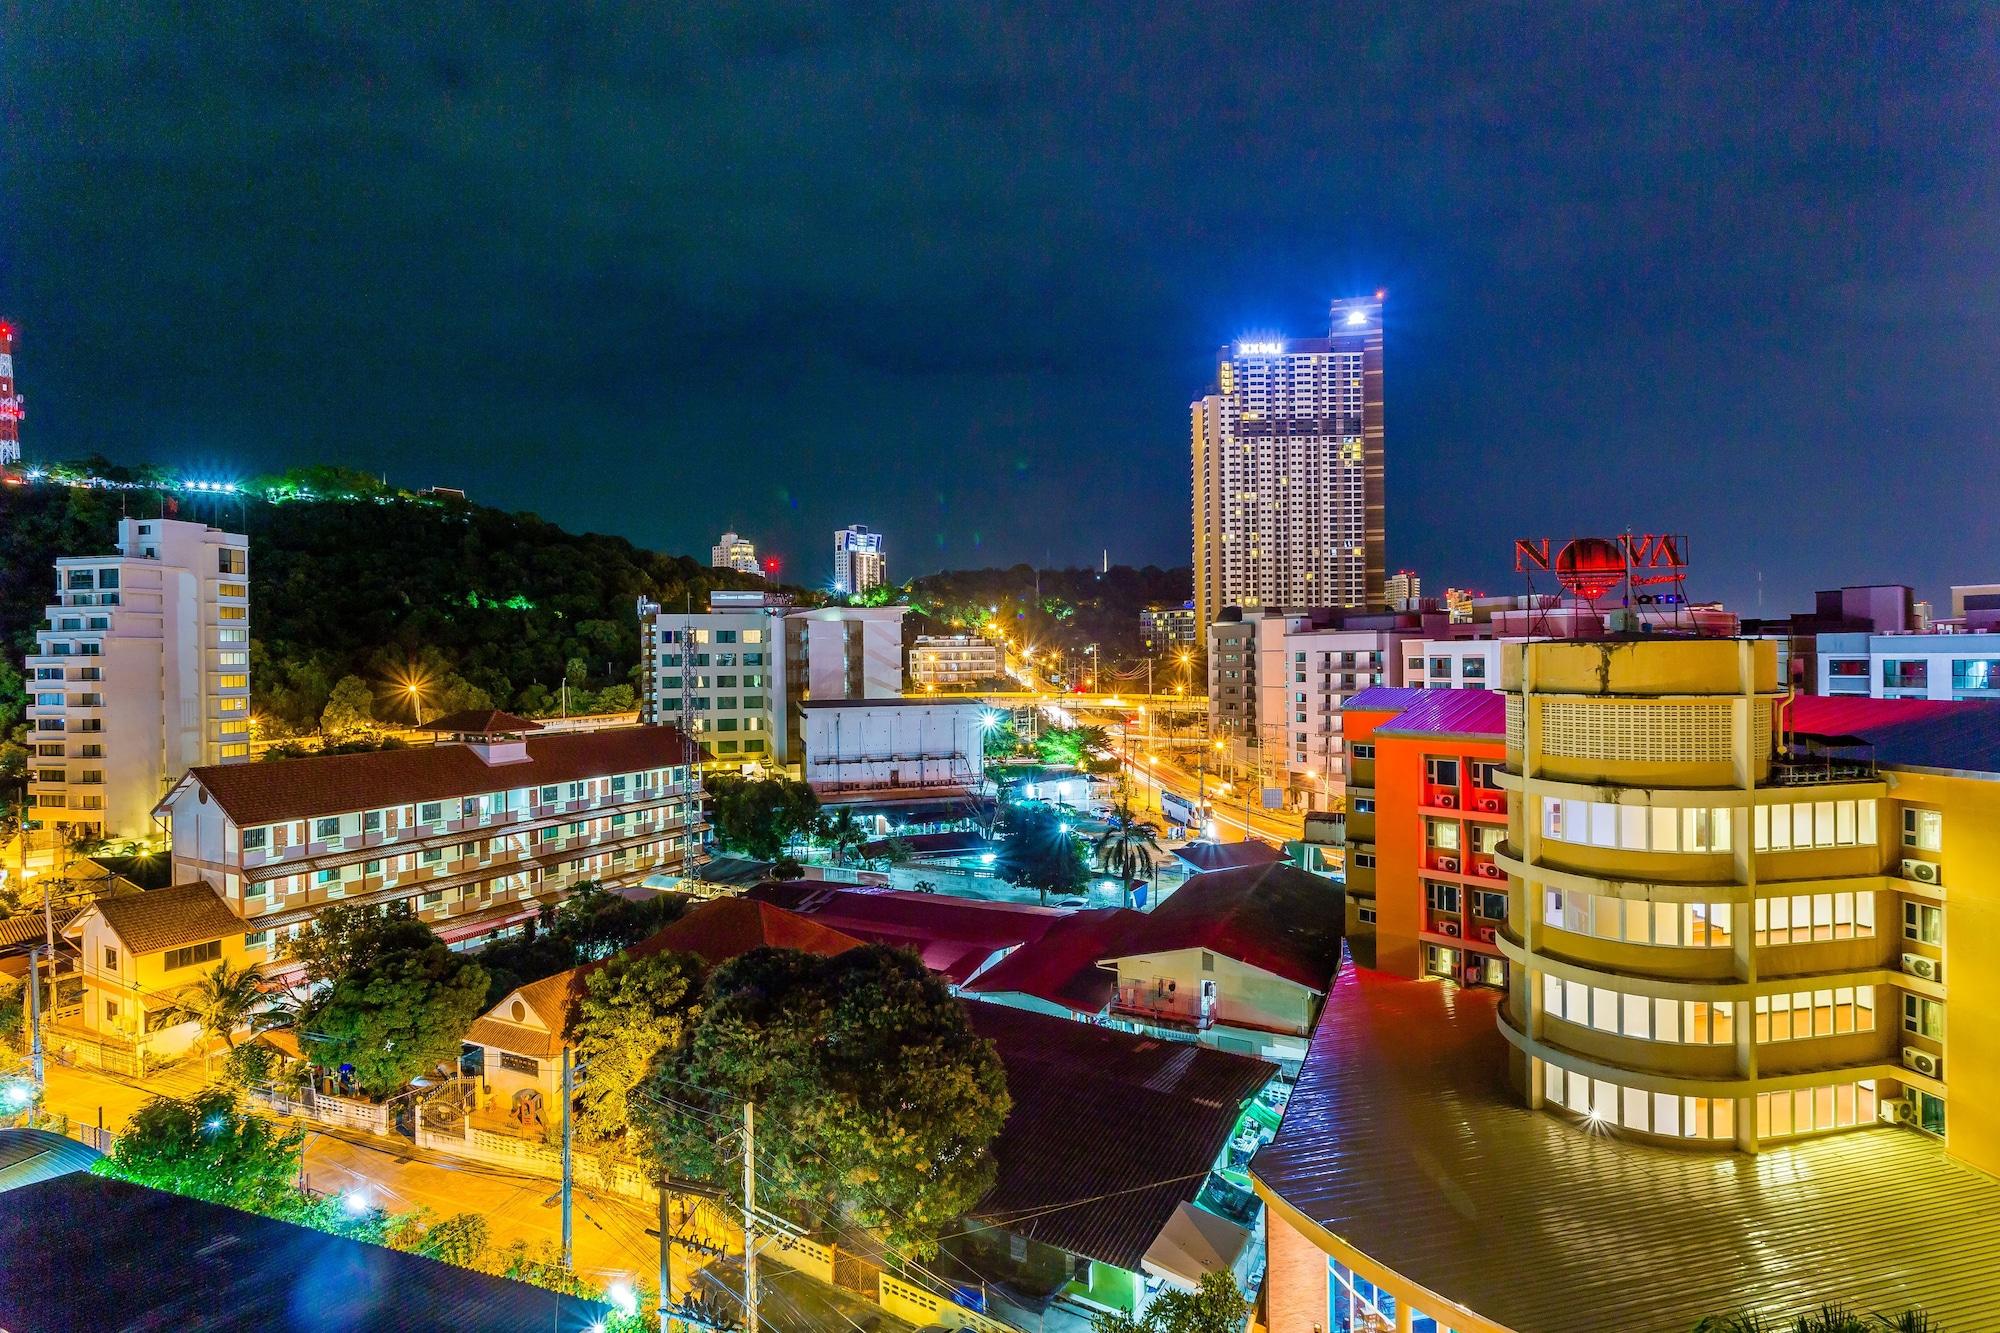 Nova Platinum Pattaya, Pattaya